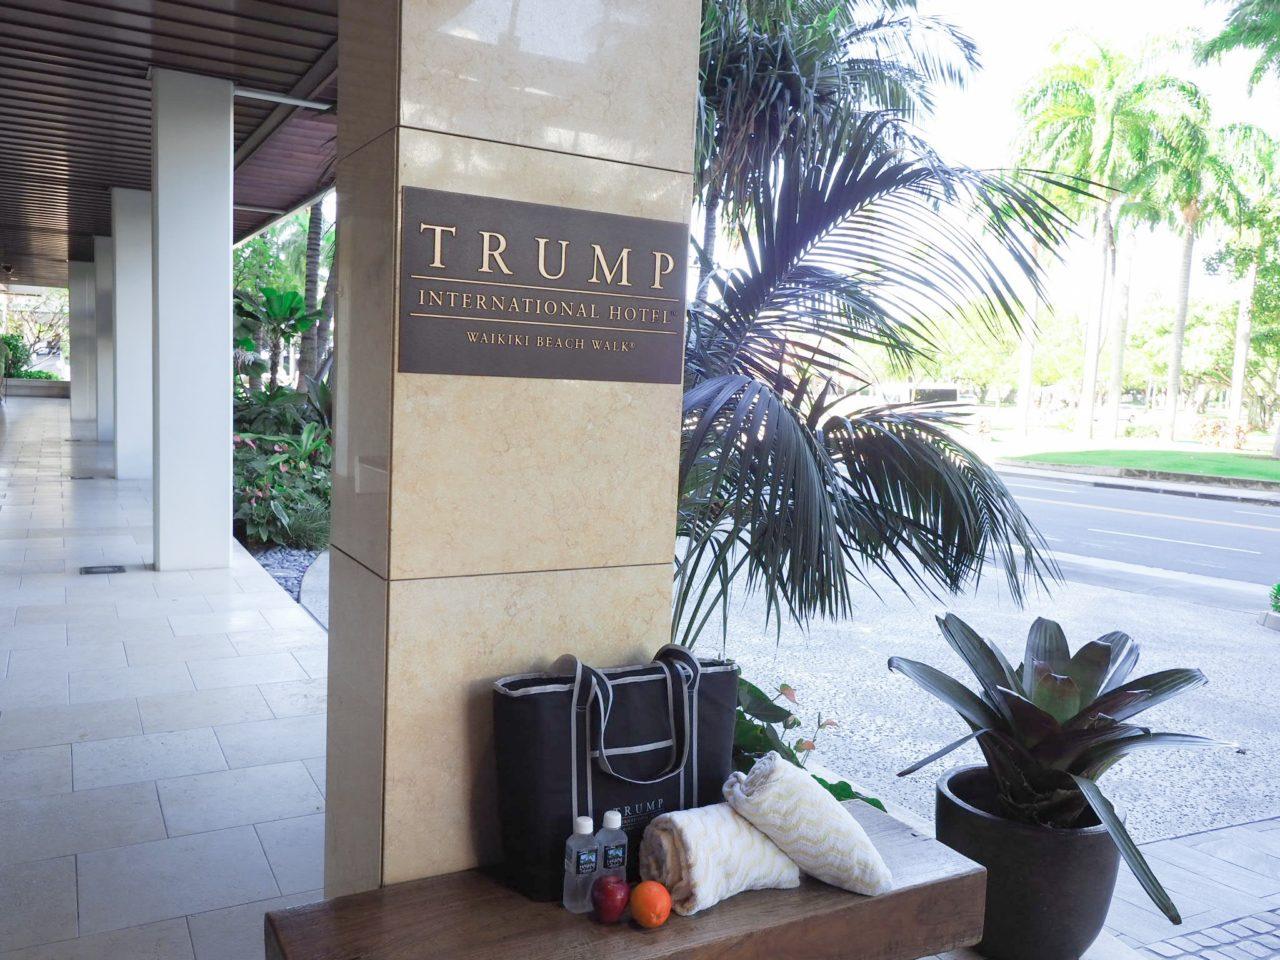 img 4913 - Trump International Hotel Waikiki - ファミリーステイに大満足!トランプ インターナショナル ホテルステイ